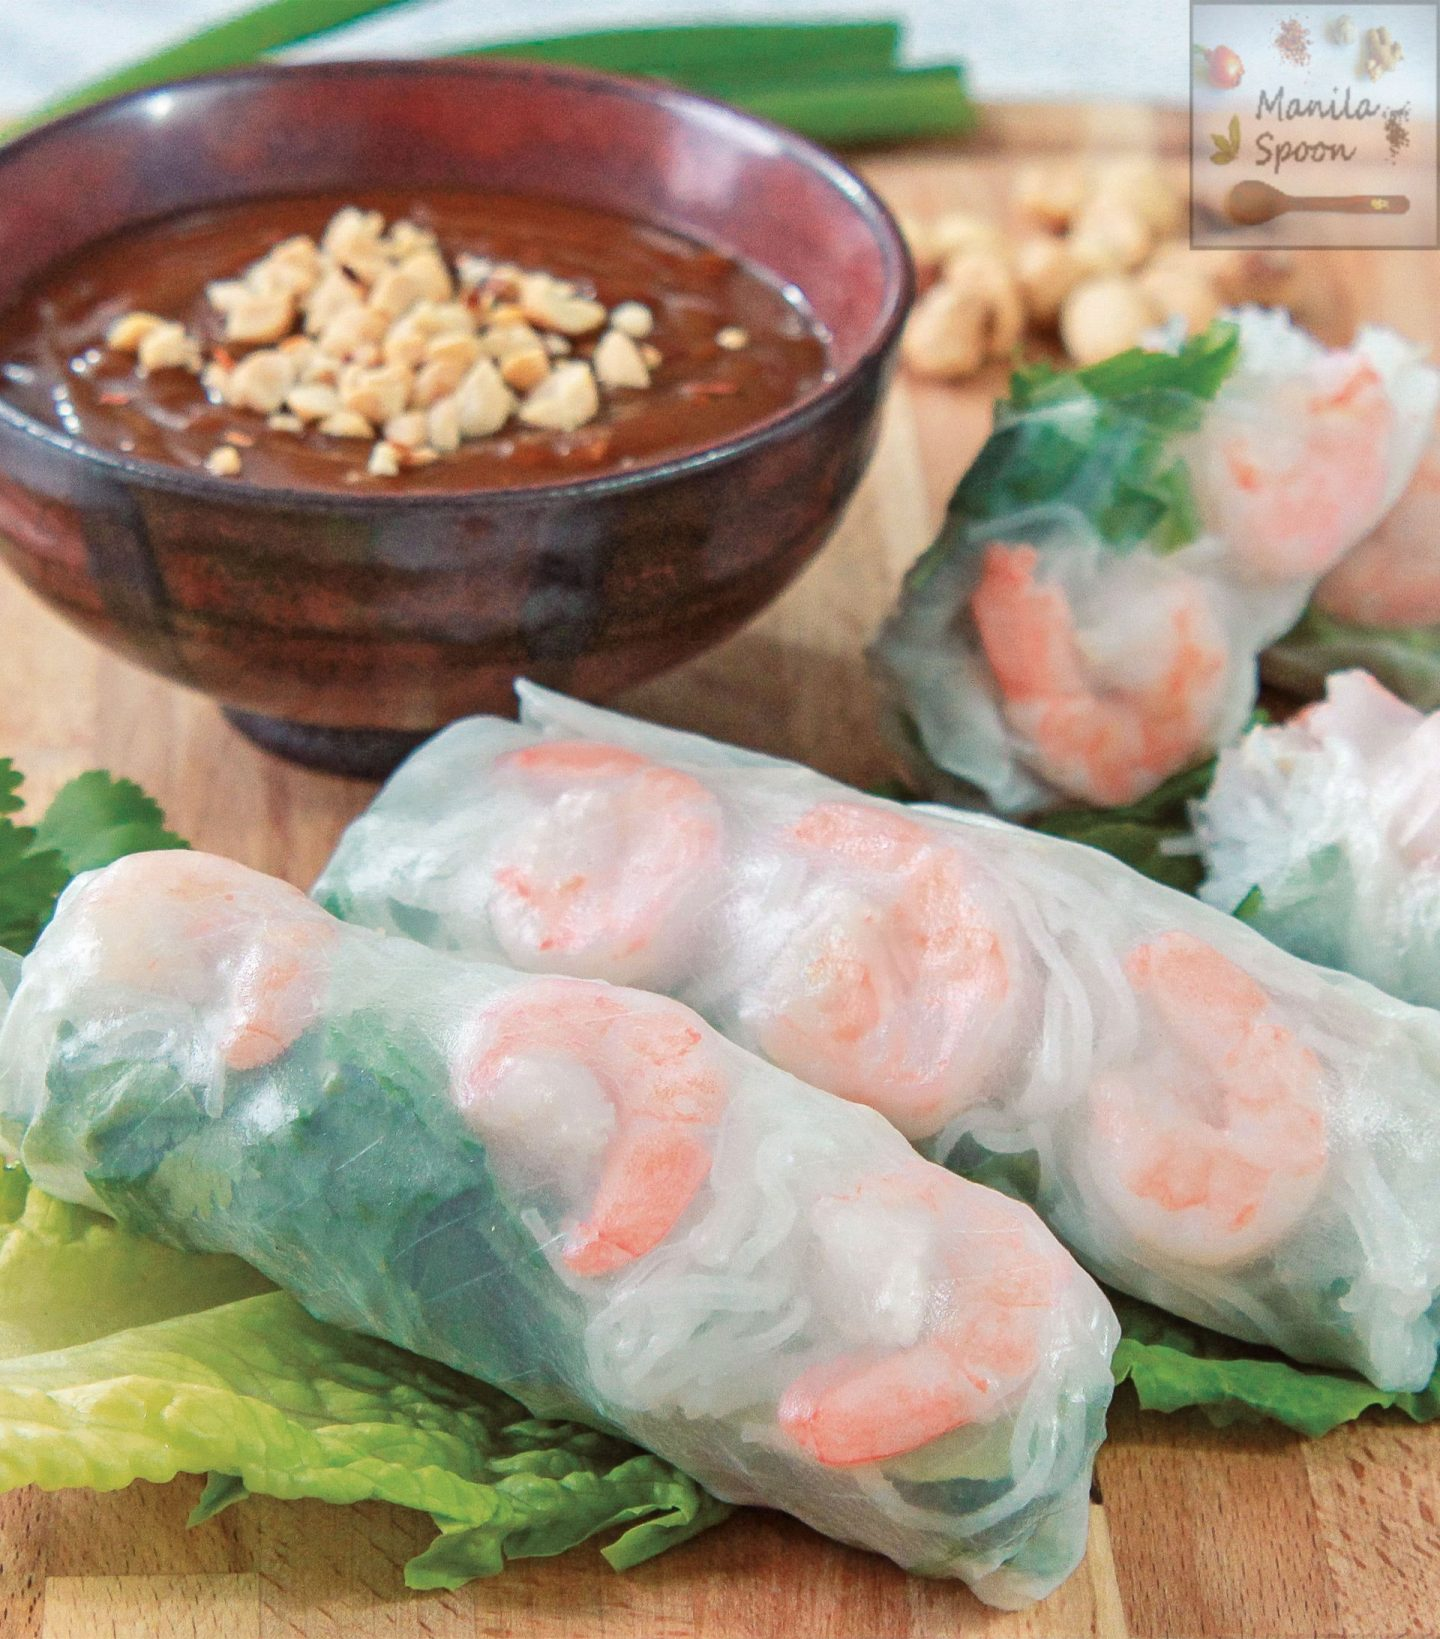 Goi Cuon (Vietnamese Fresh Spring Rolls)